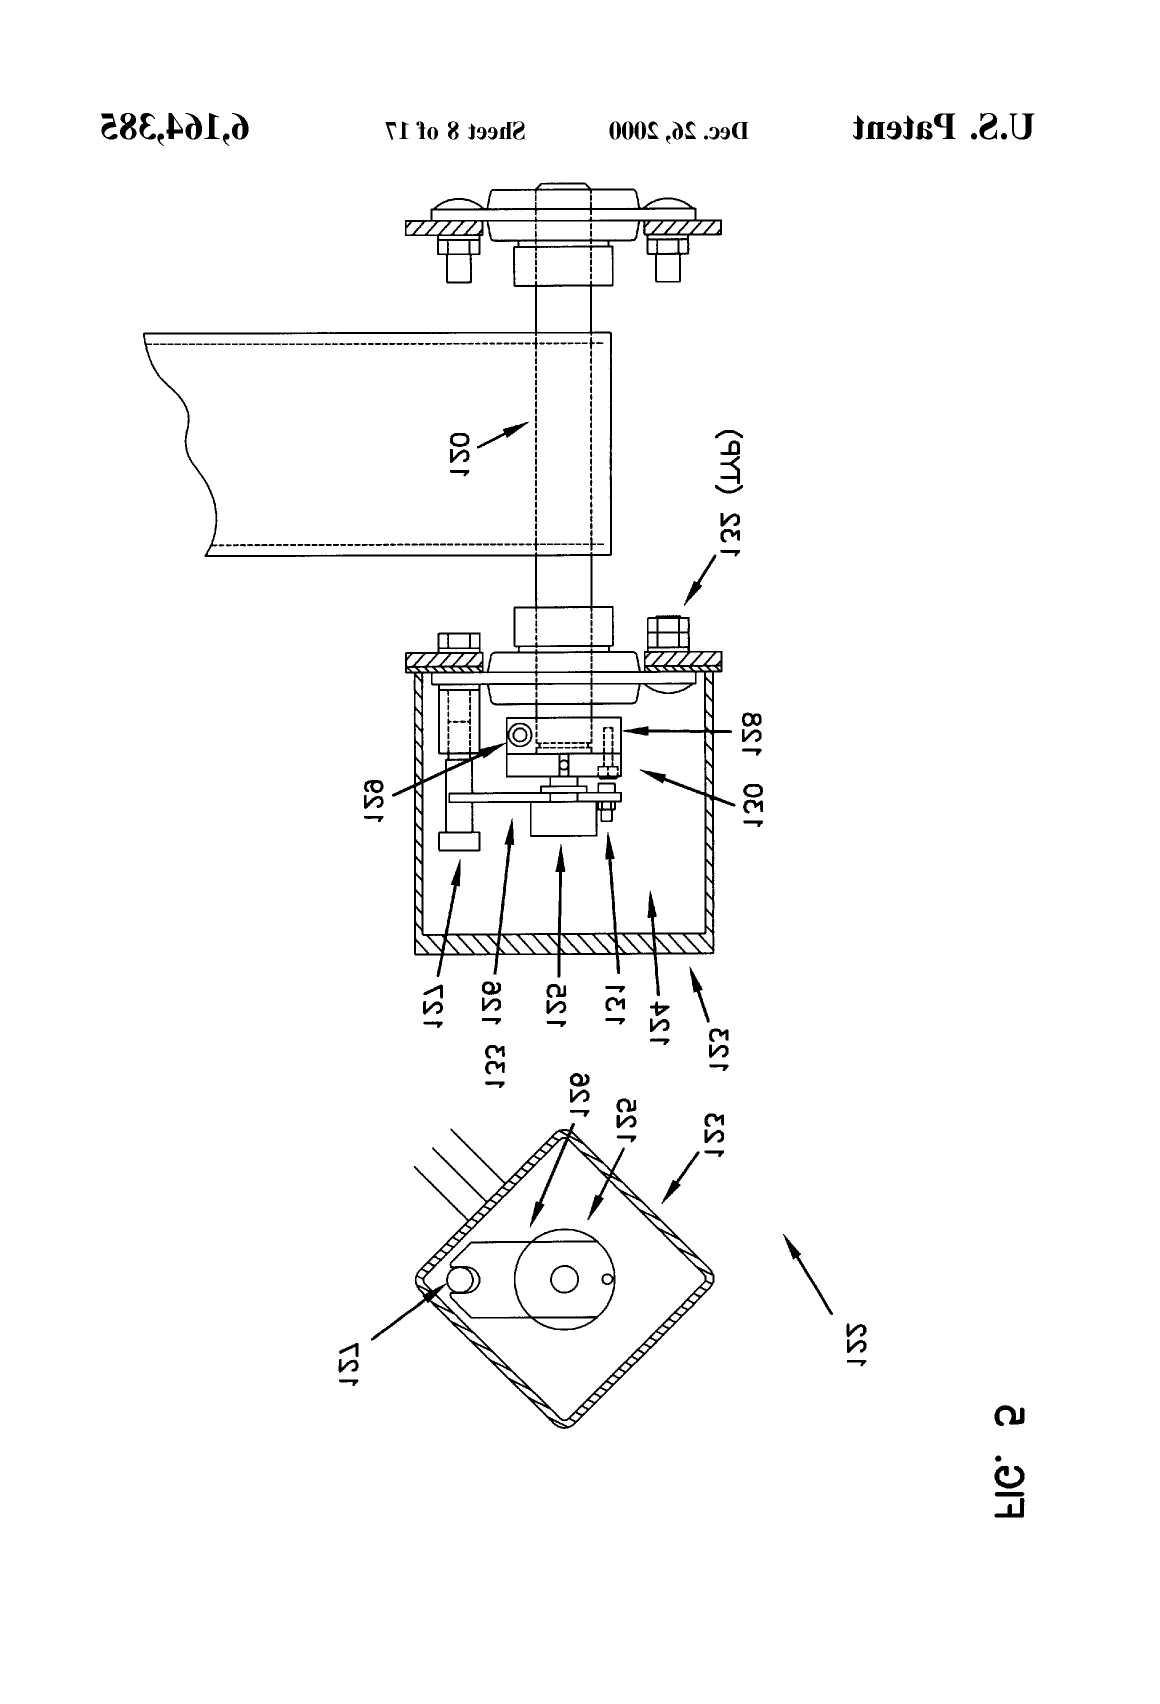 Mcdonnell Miller 150 Wiring Diagram | Wiring Diagram - Mcdonnell Miller Low Water Cutoff Wiring Diagram